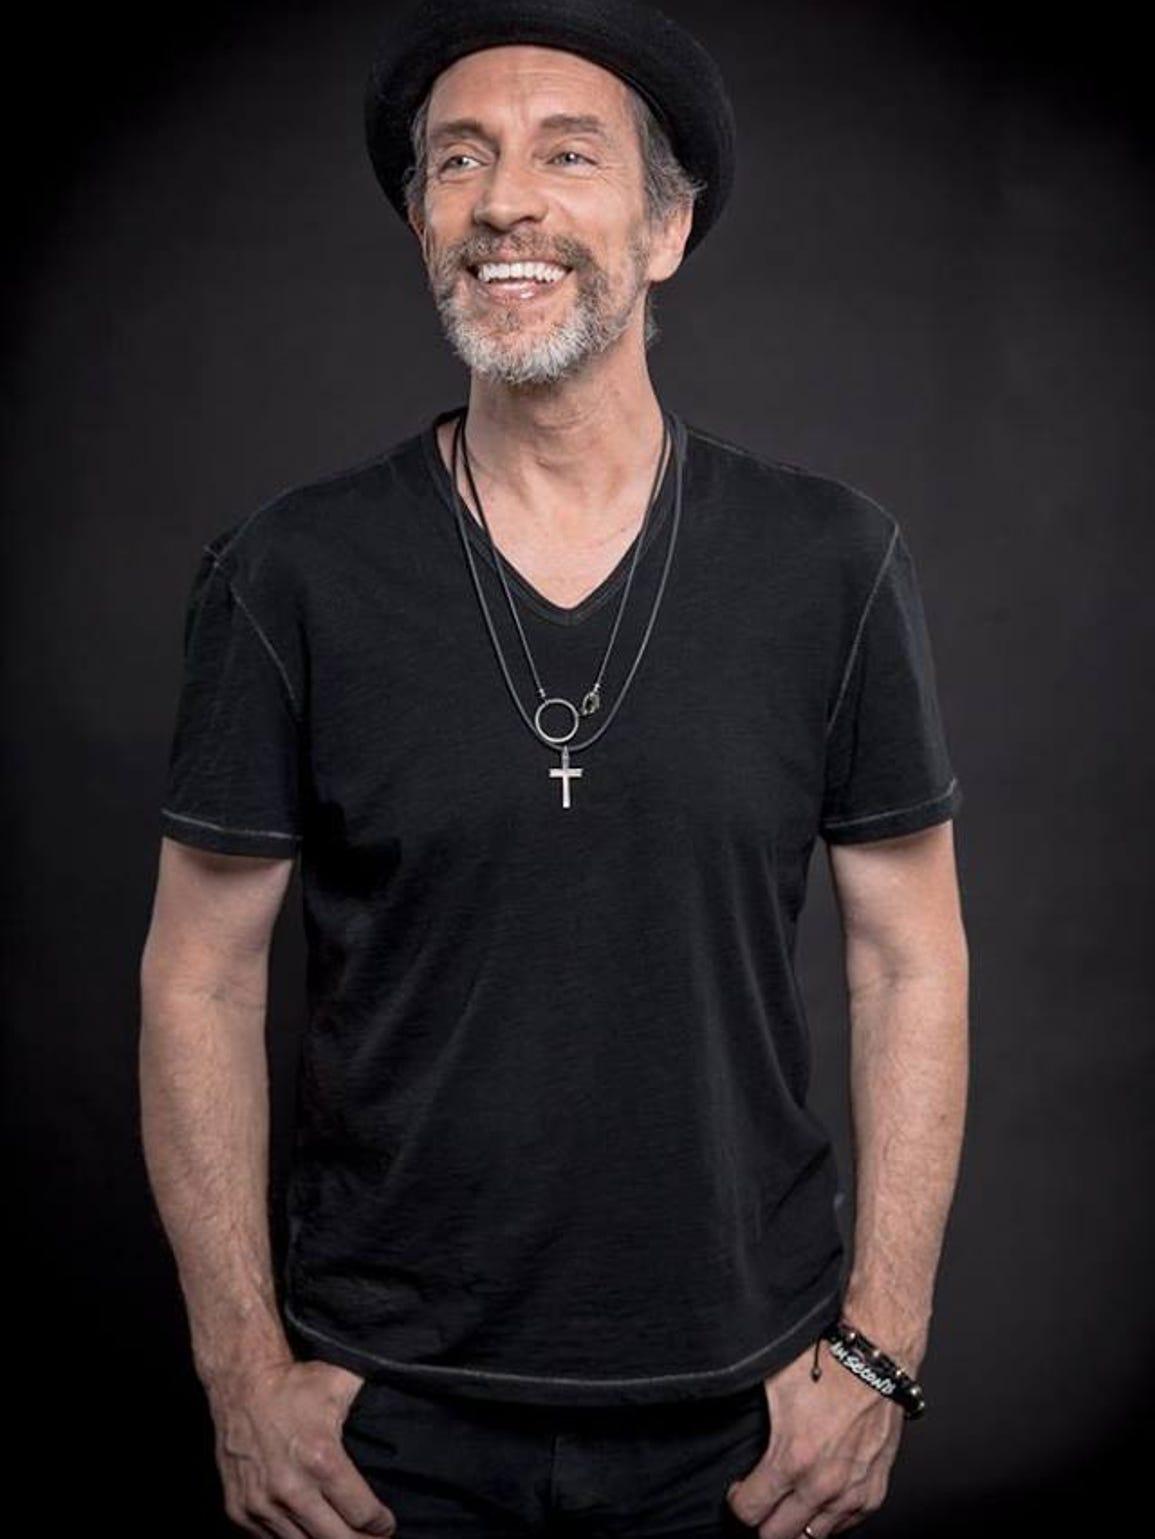 Gordon Kennedy will perform Saturday at Birdsong Studio